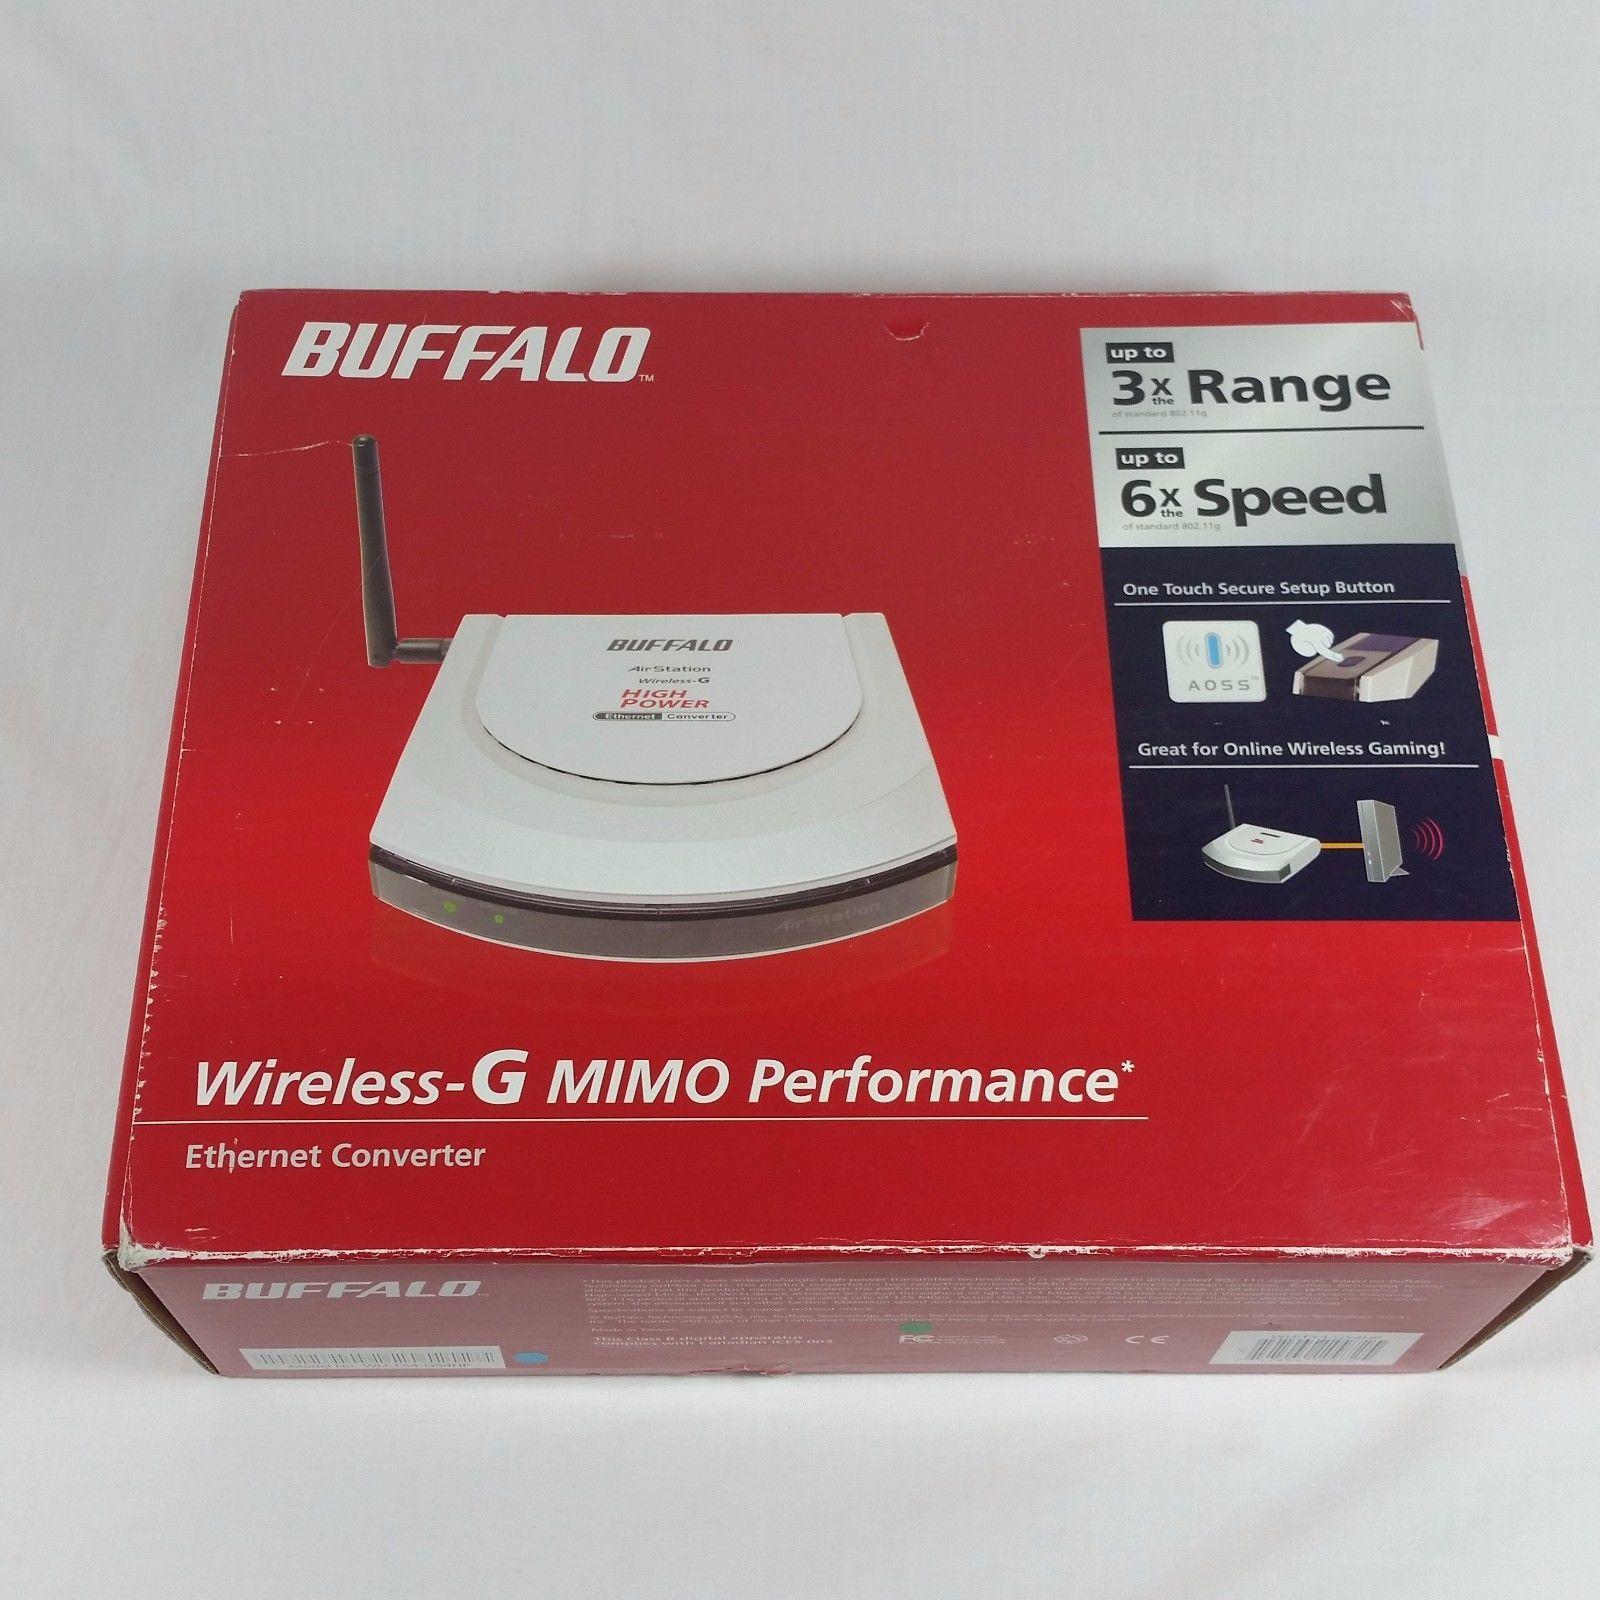 Buffalo airstation turbo g high power wli tx4 g54hp wireless buffalo airstation turbo g high power wli tx4 g54hp wireless ethernet converter keyboard keysfo Image collections